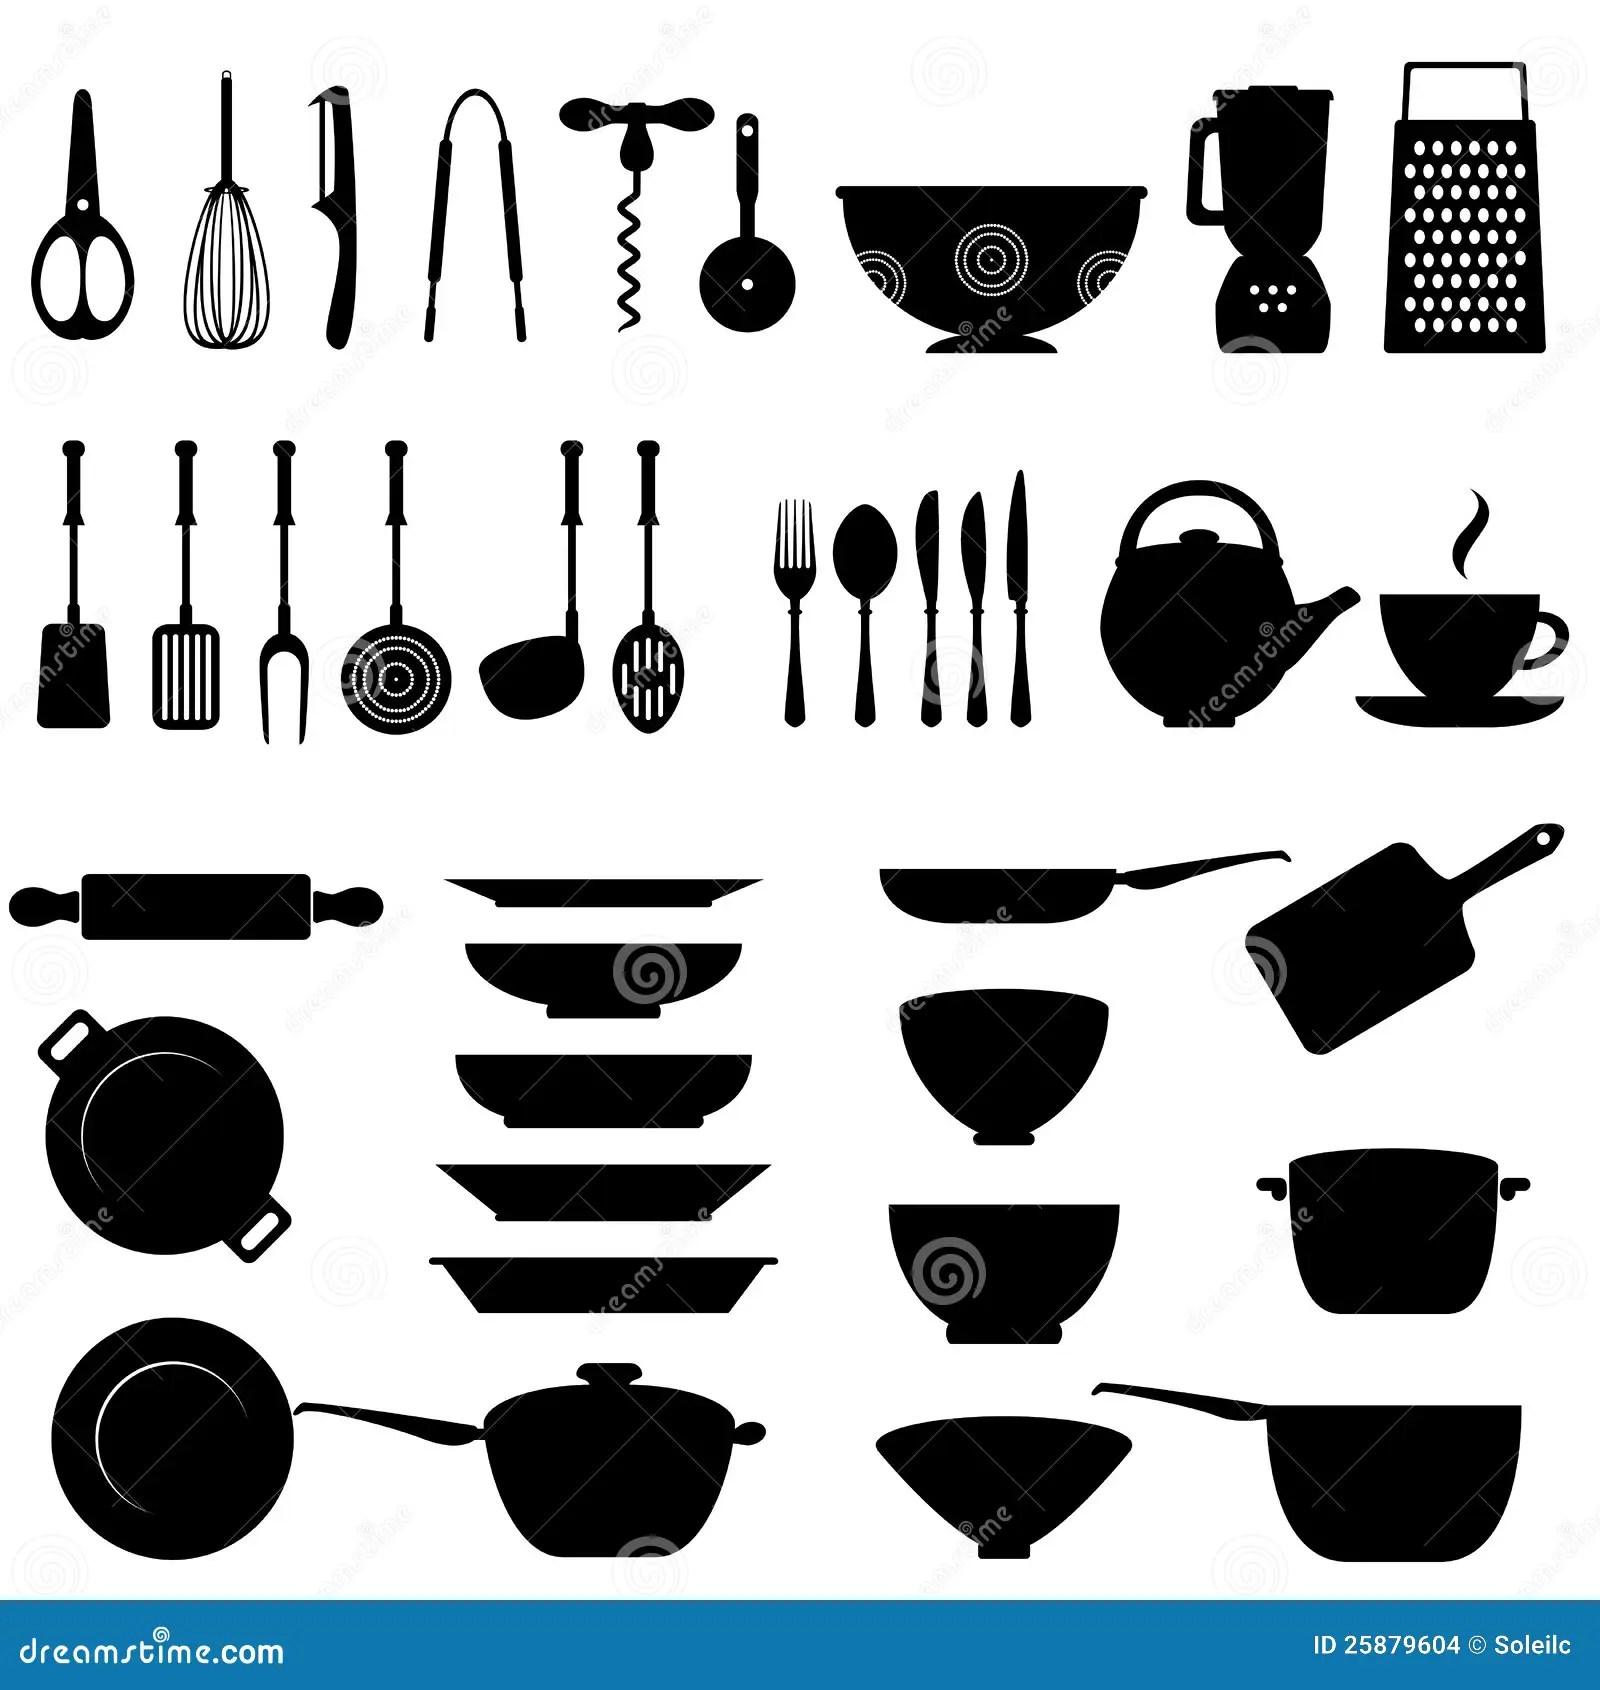 ustensile de cuisine professionnel